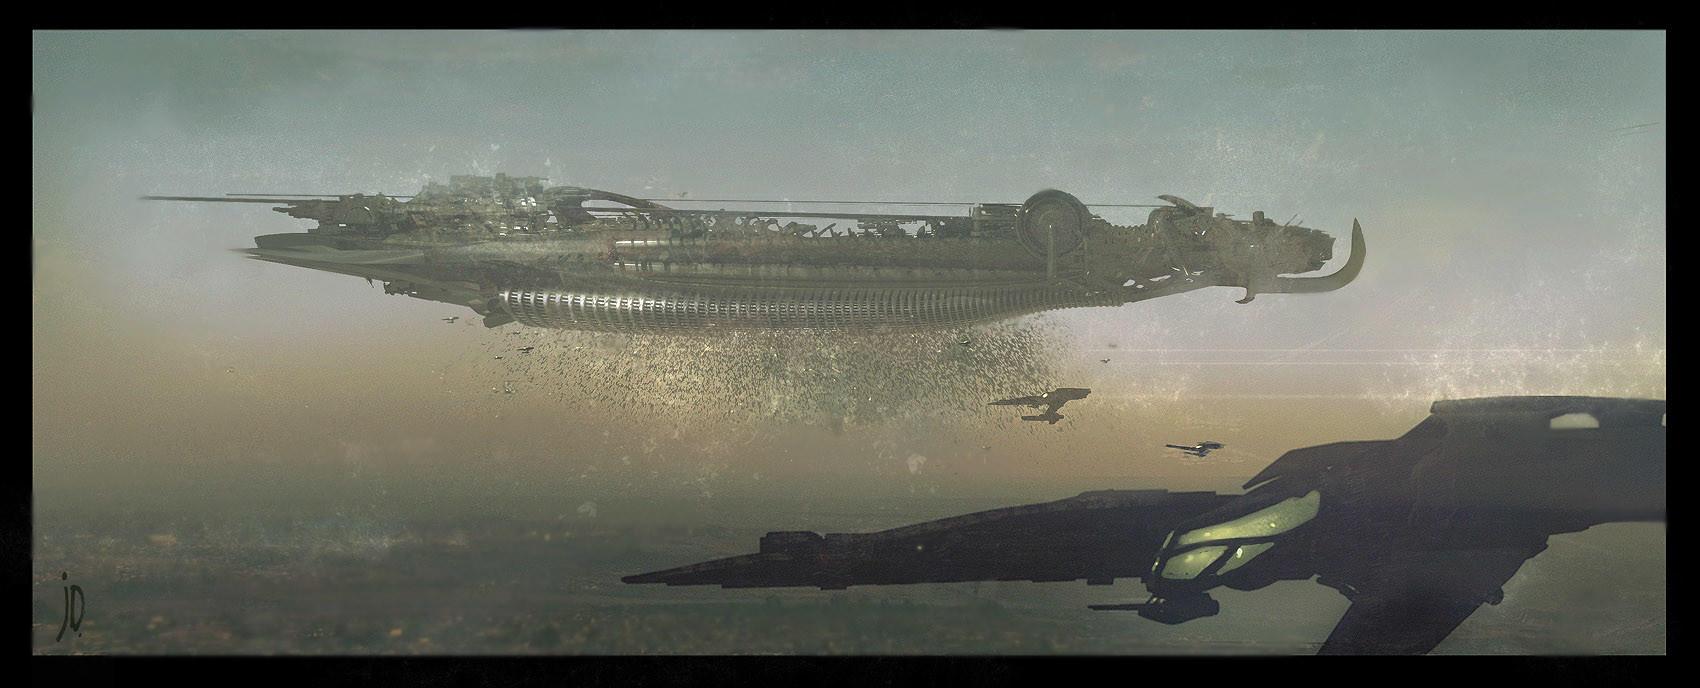 John Dickenson Carriership Vanduul the Swarm